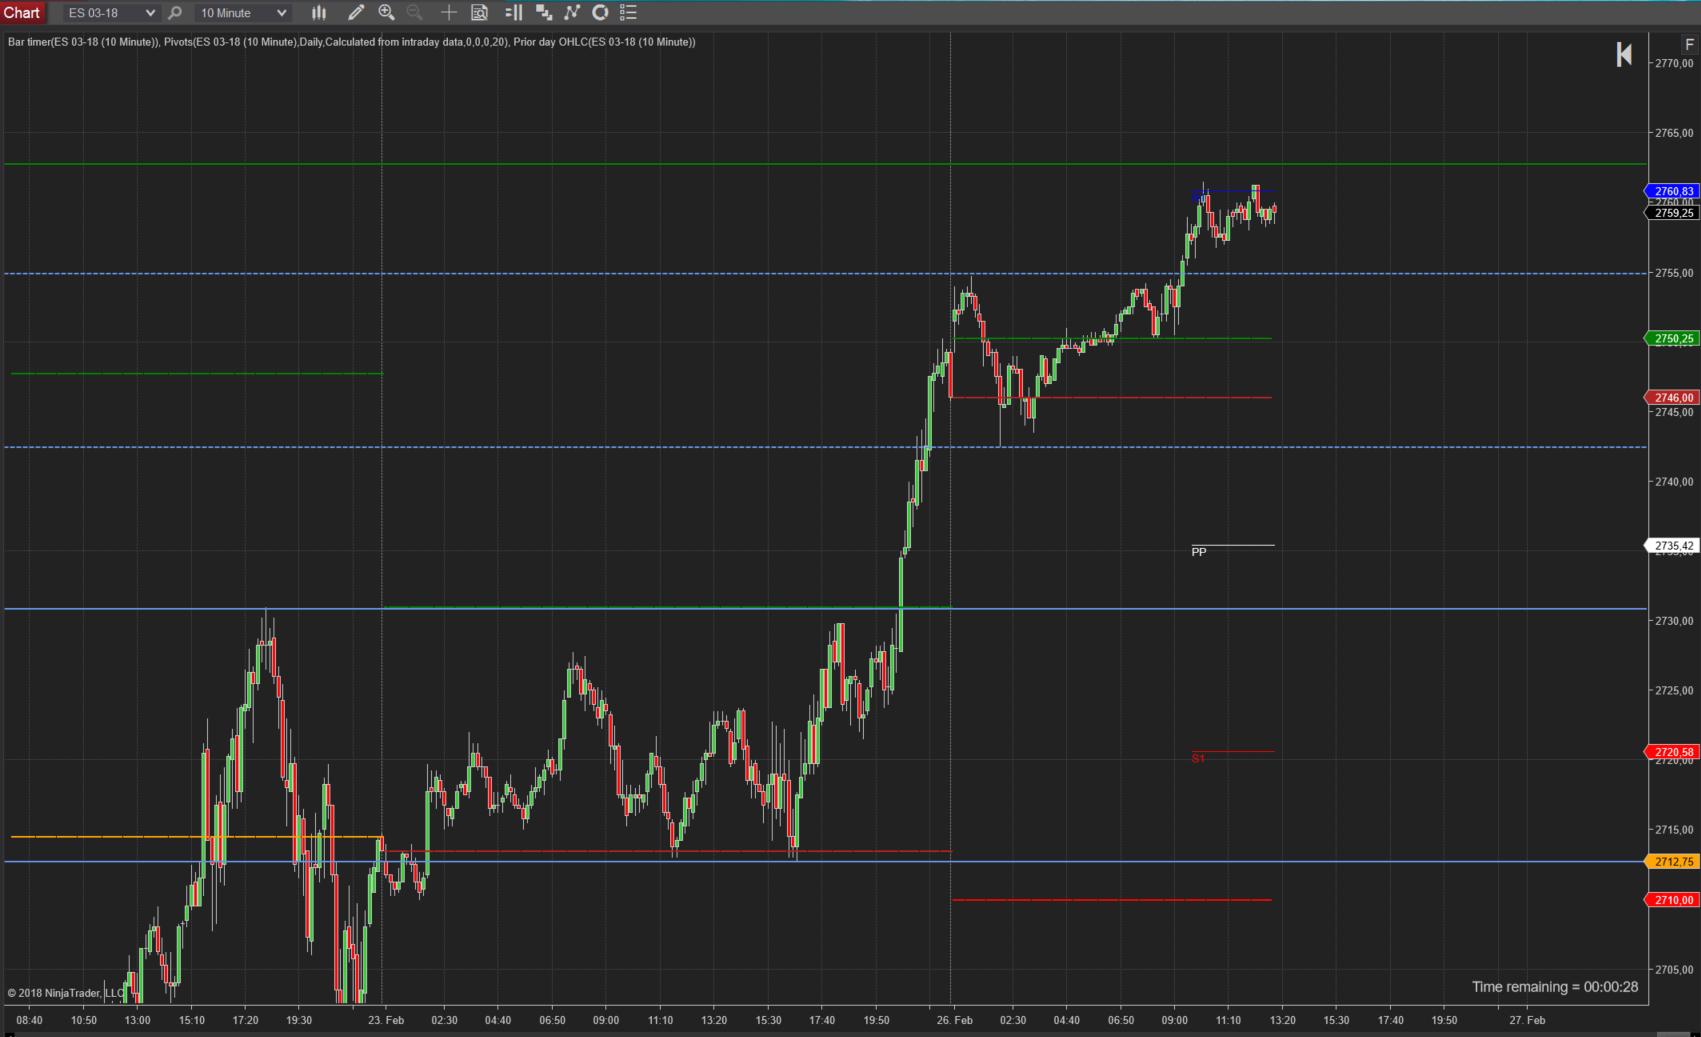 Trading im SP500 -bereits wieder long?